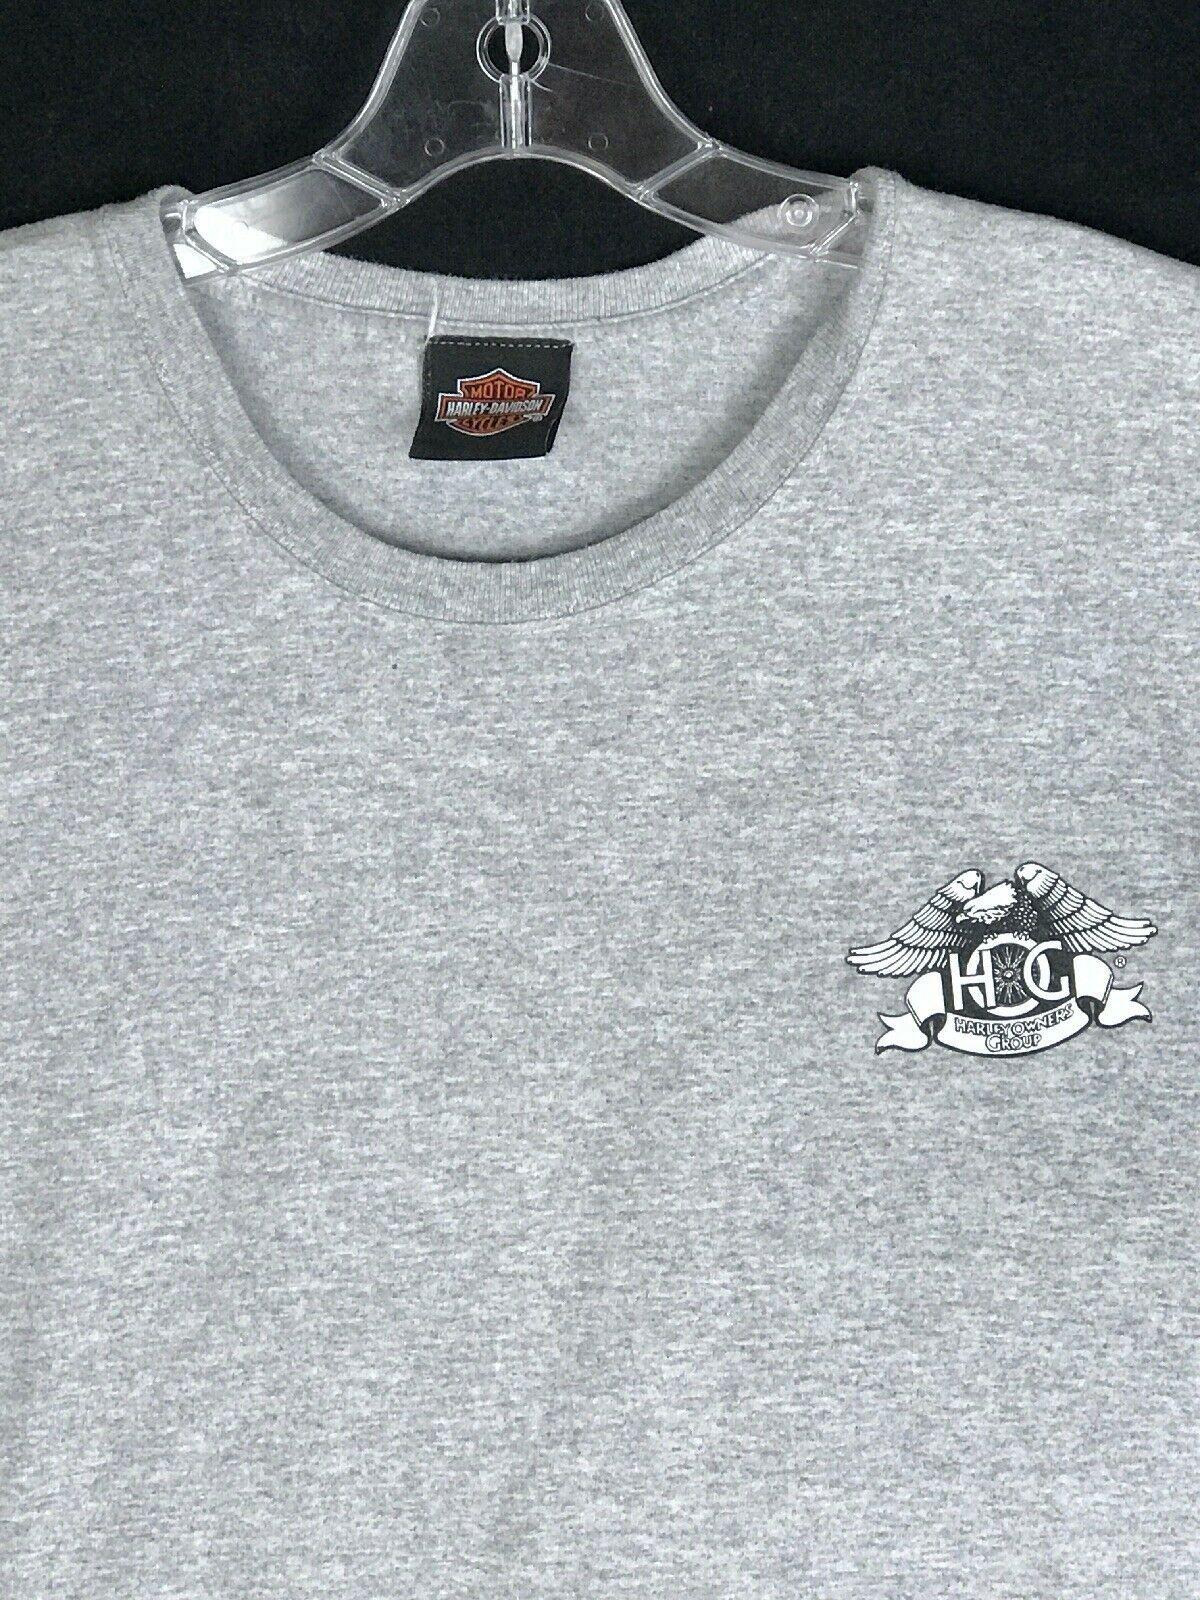 XL HOG Harley Owners Group Davidson Gray T Shirt 2010 Sturgis